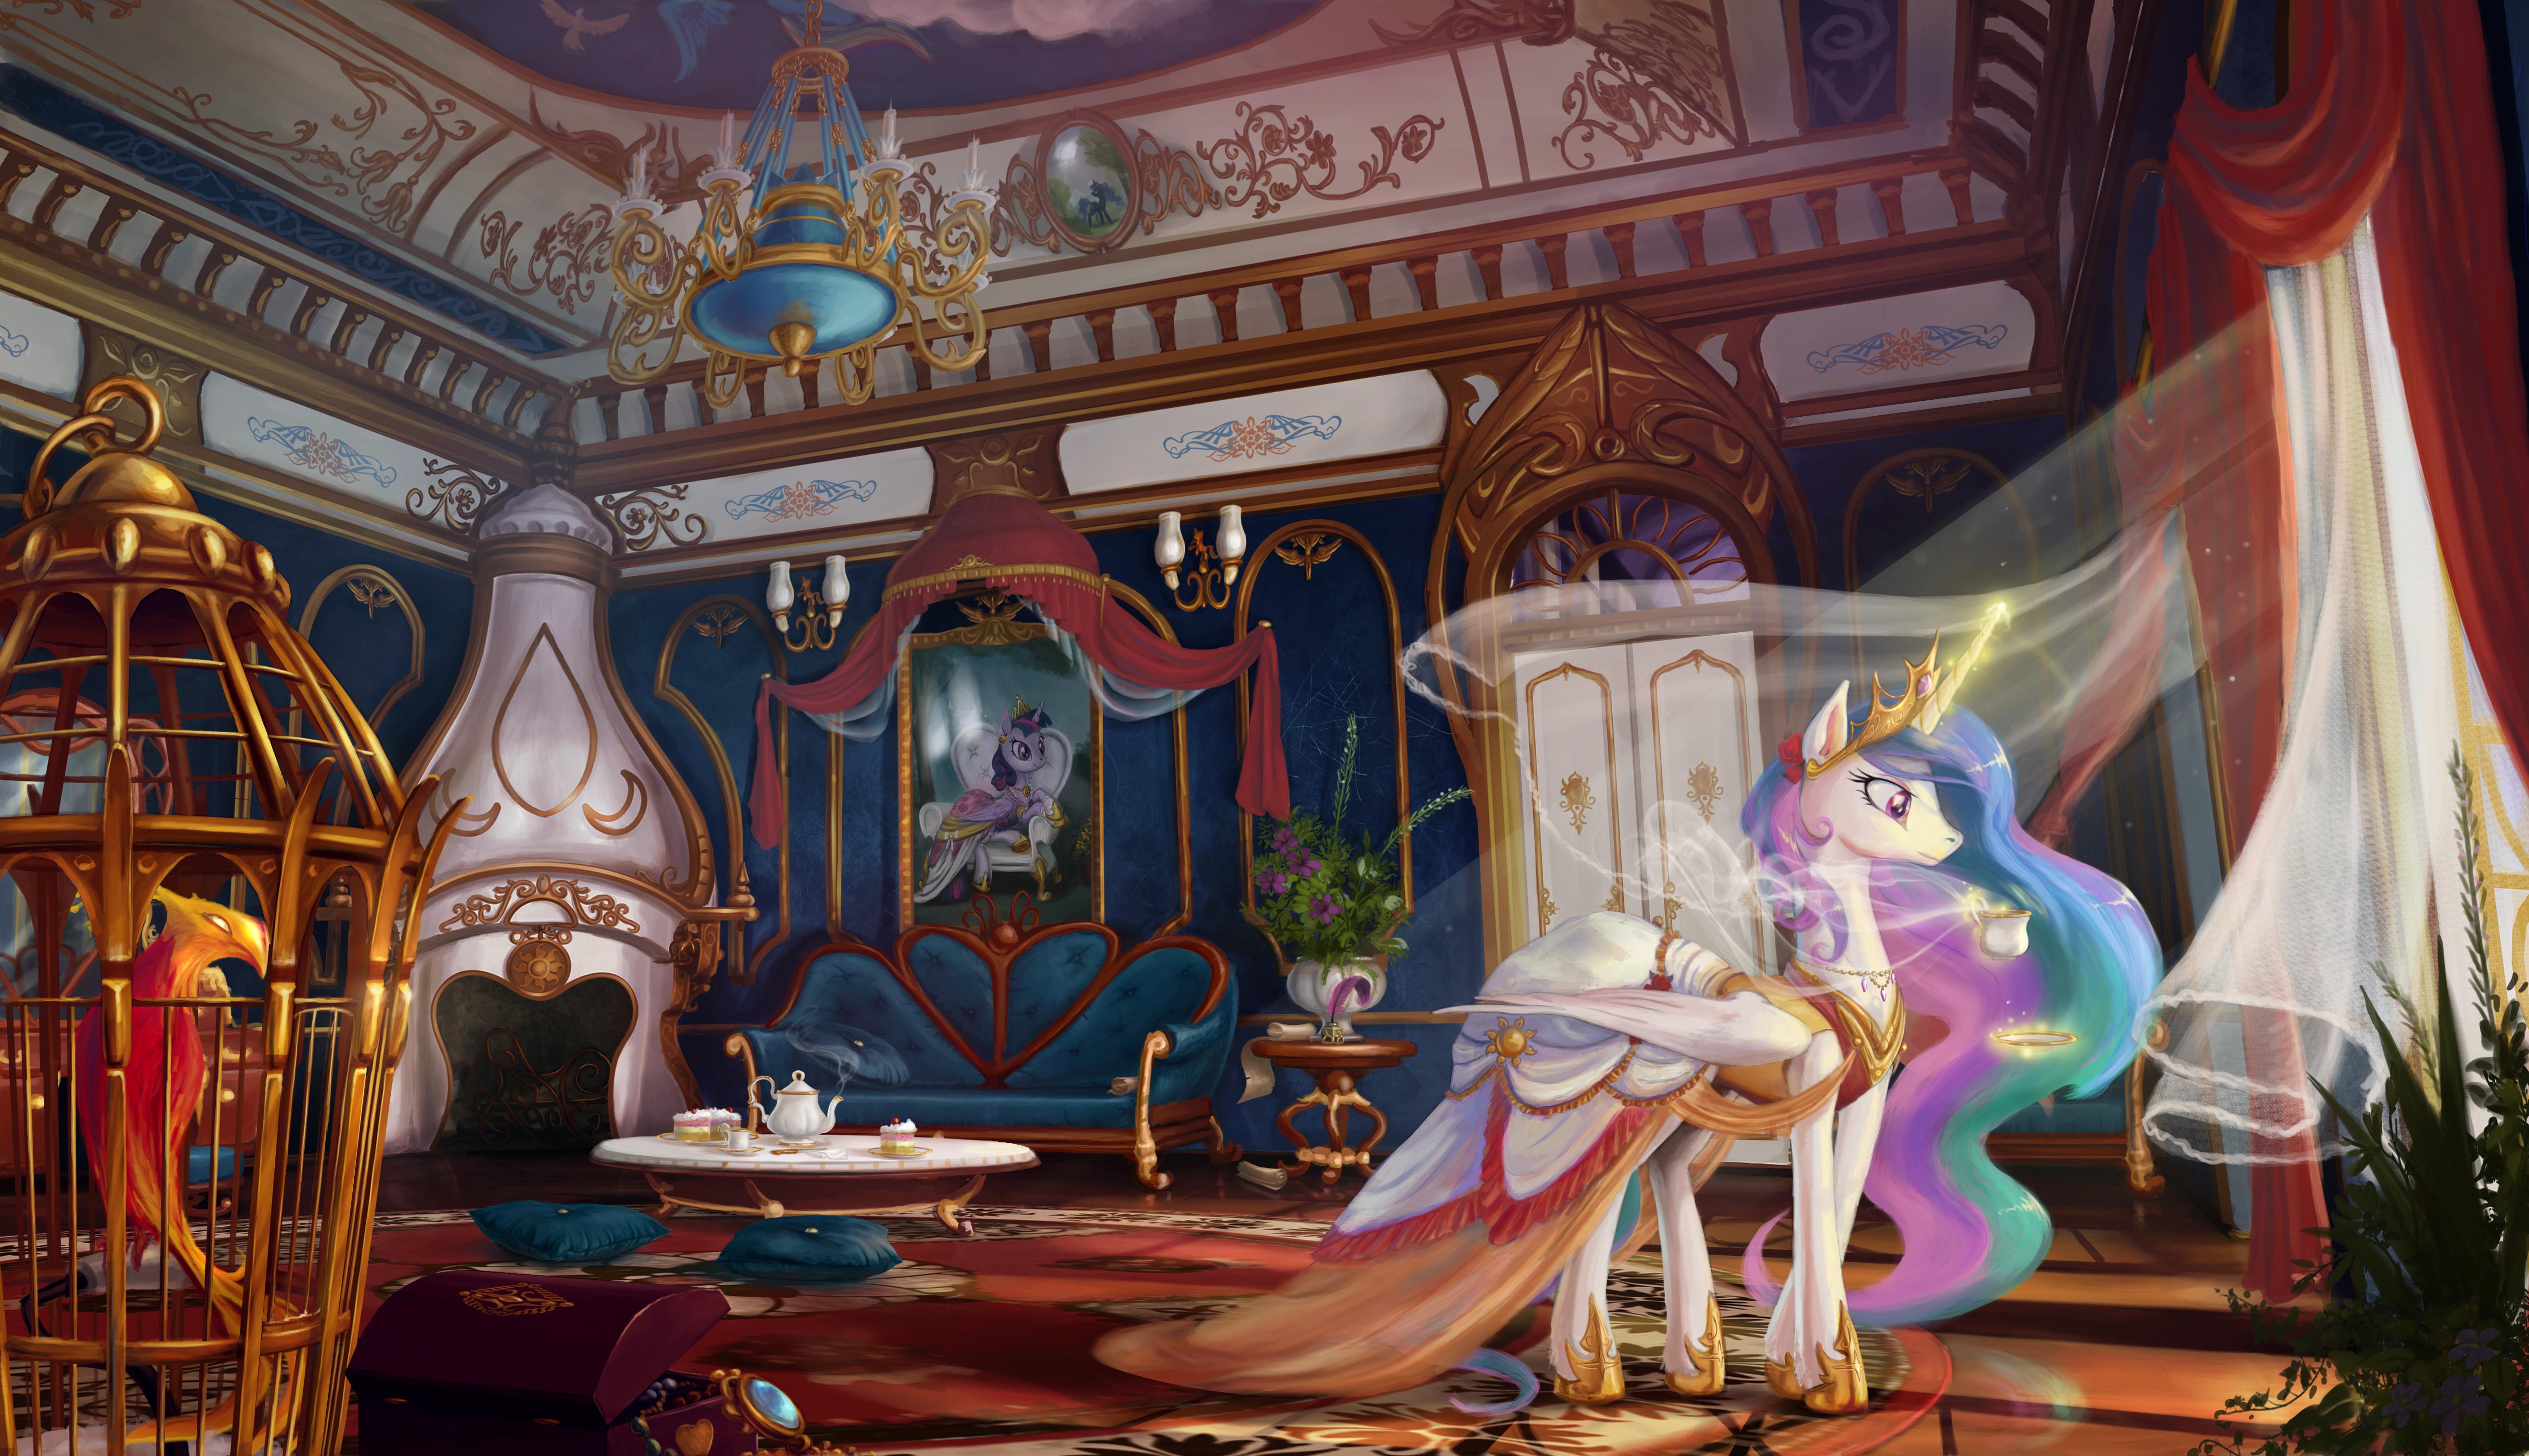 Wallpaper My Little Pony Putri Celestia 5255x3026 Balykkk 1176459 Hd Wallpapers Wallhere